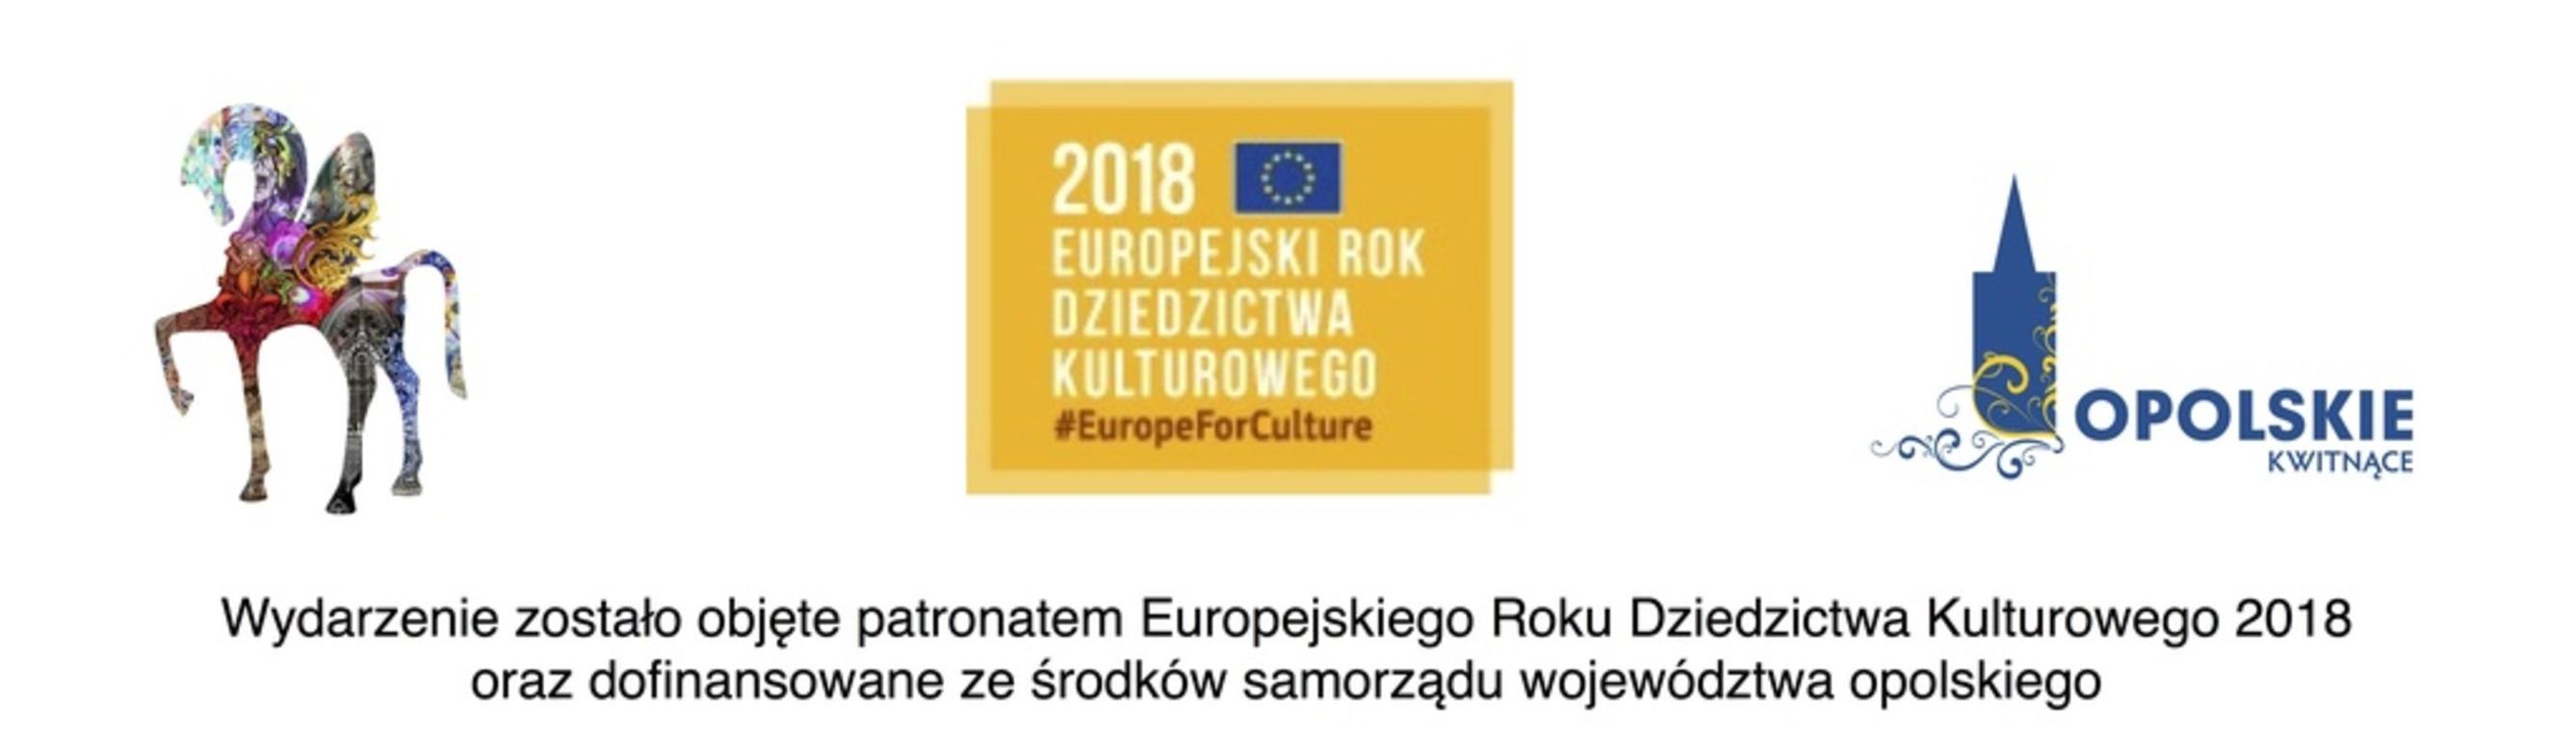 erdk2018_wo_logo.jpg